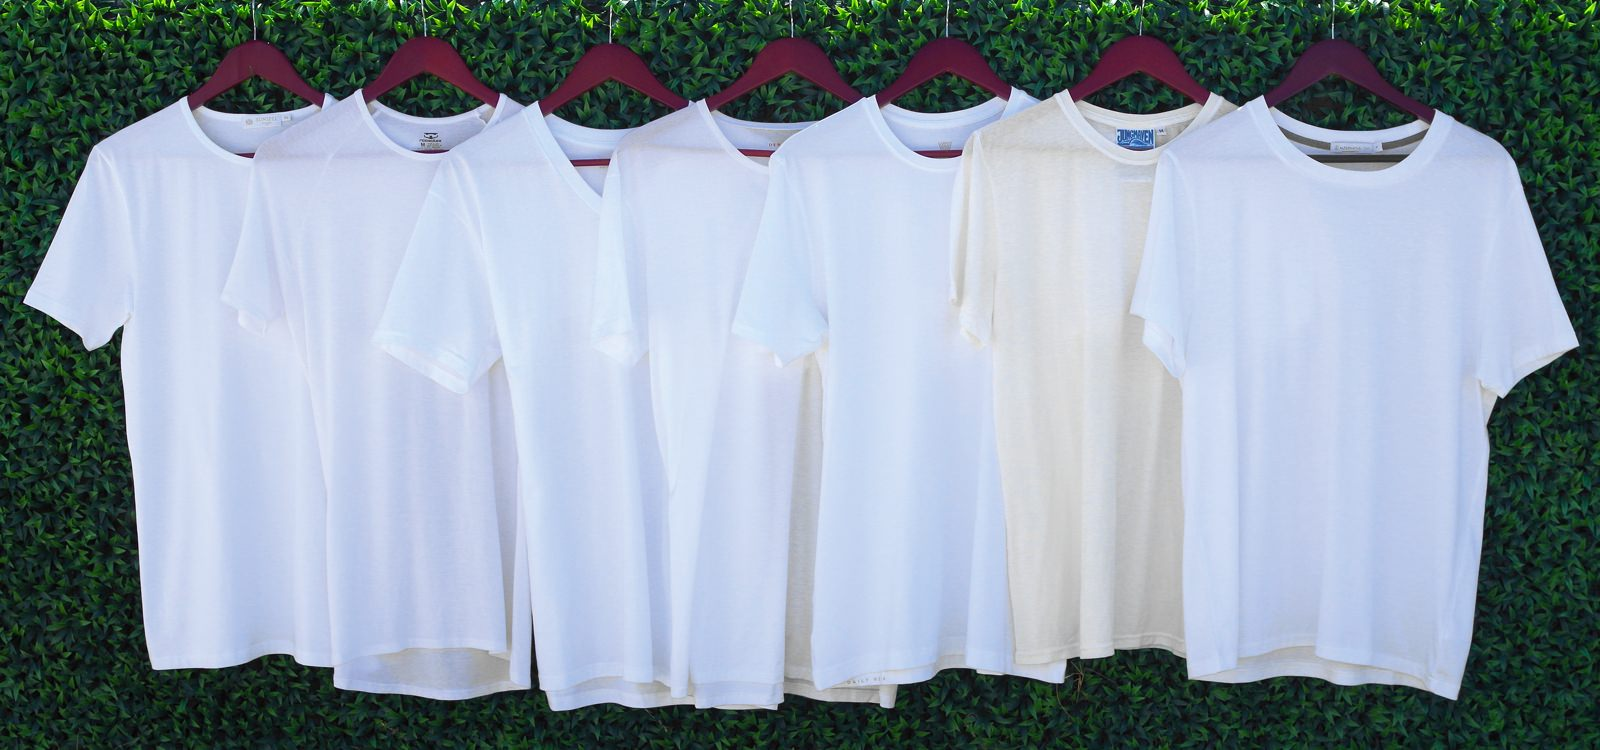 Best Undershirts for Men